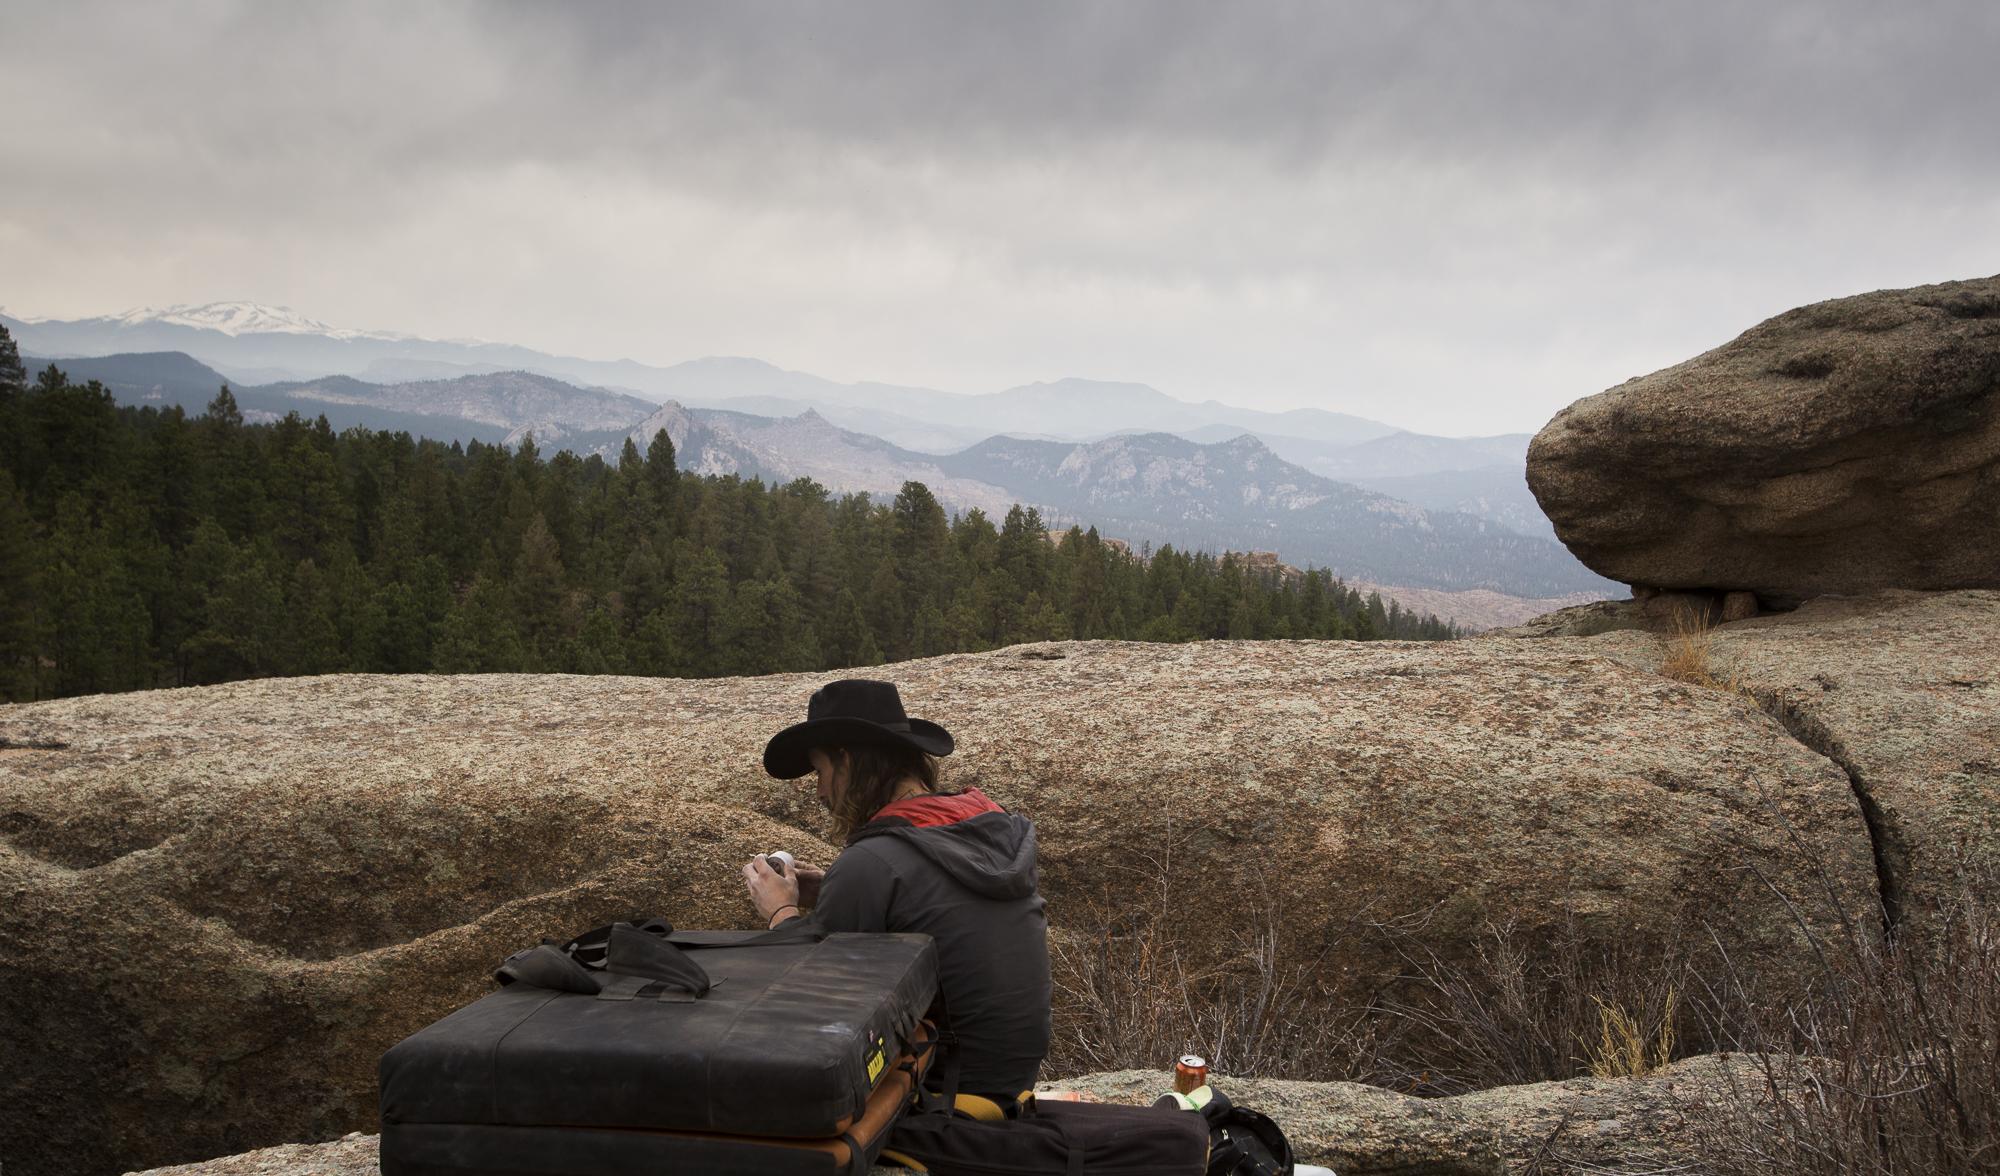 Pike_National_Forest_Bouldering_CO-4733.jpg